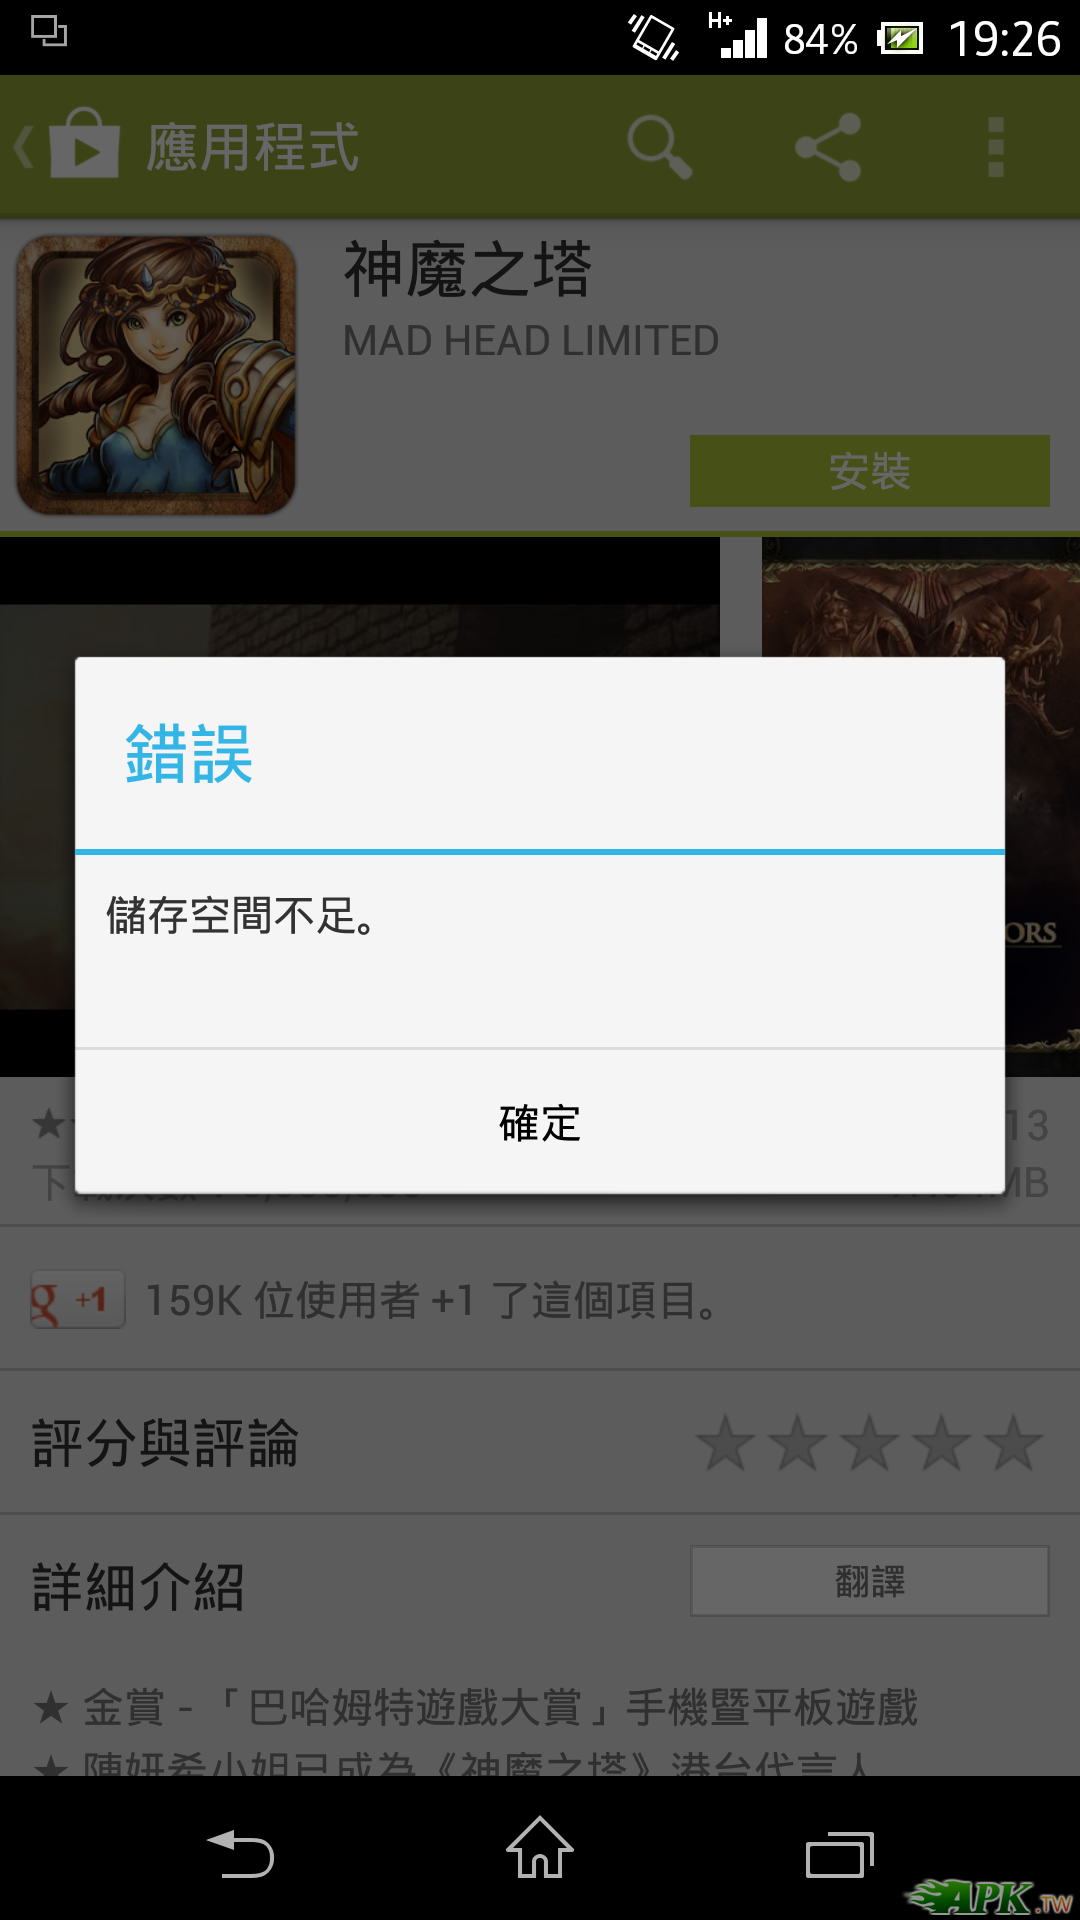 Screenshot_2013-12-14-19-26-43.png